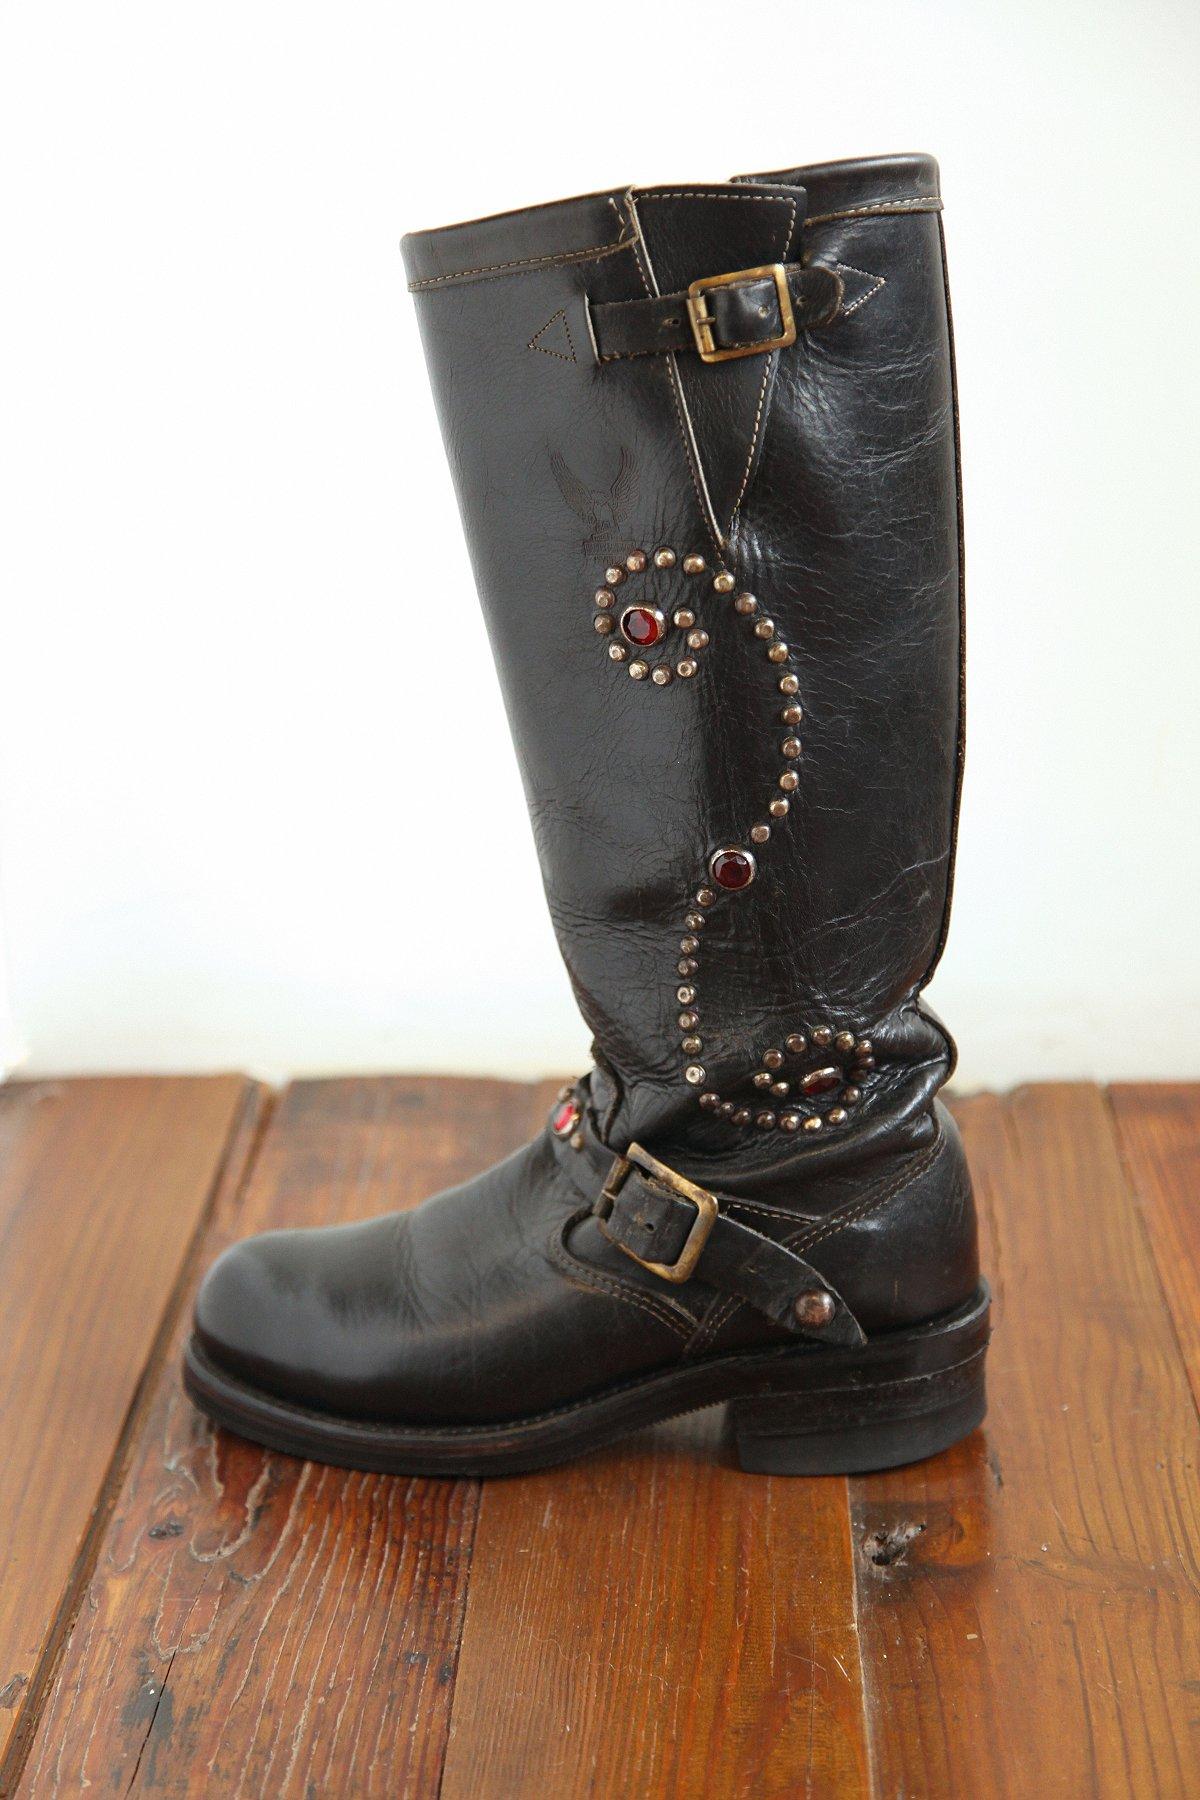 Vintage Studded Combat Boots